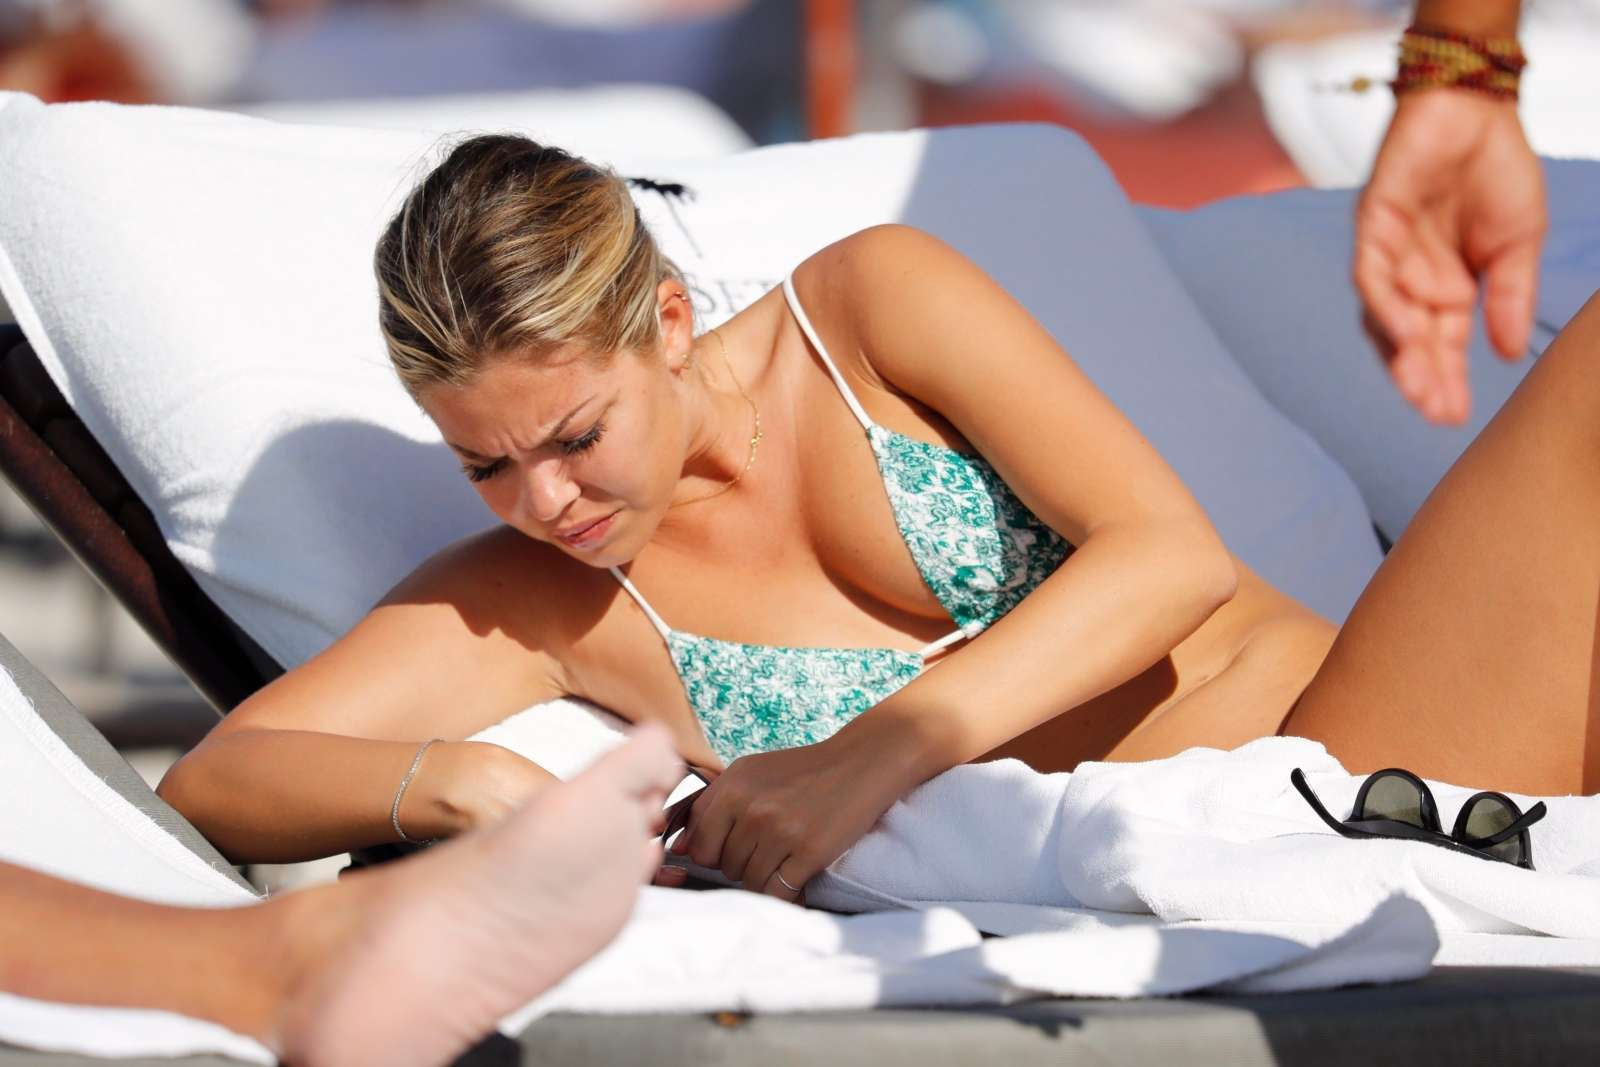 Constance Caracciolo 2017 : Constance Caracciolo in Bikini Sunbathing -41